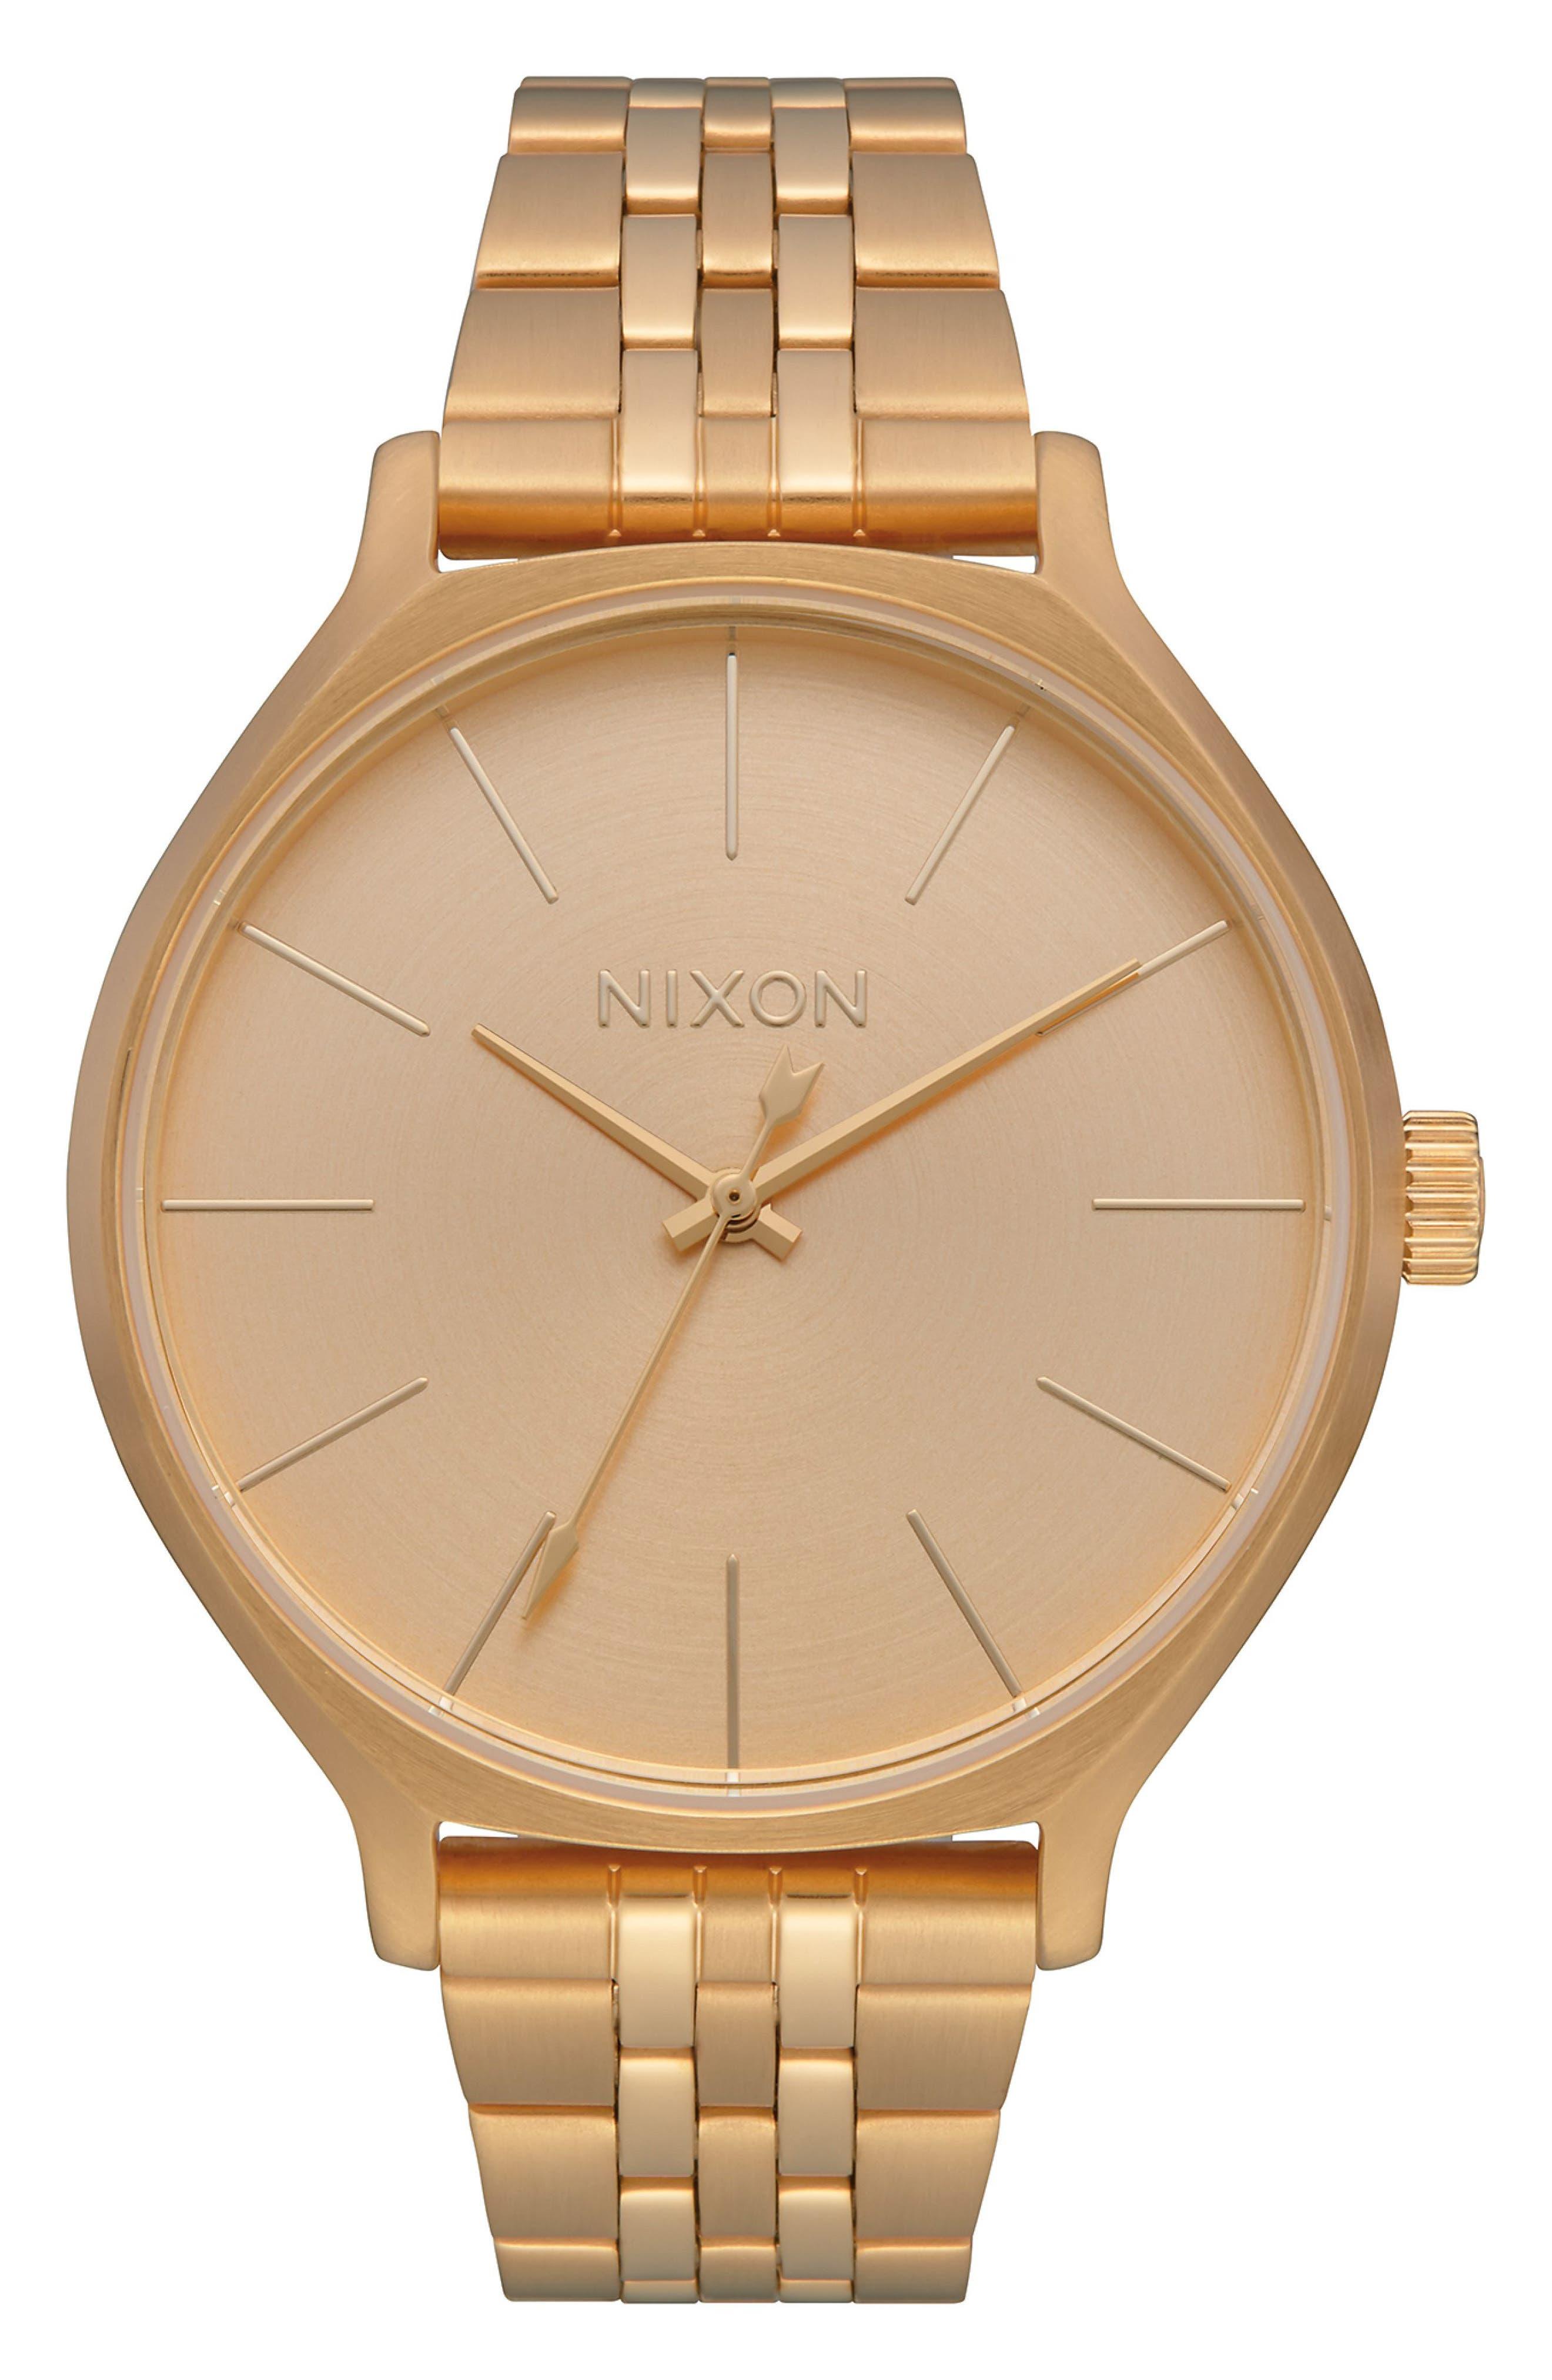 NIXON The Clique Bracelet Watch, 38Mm in Gold